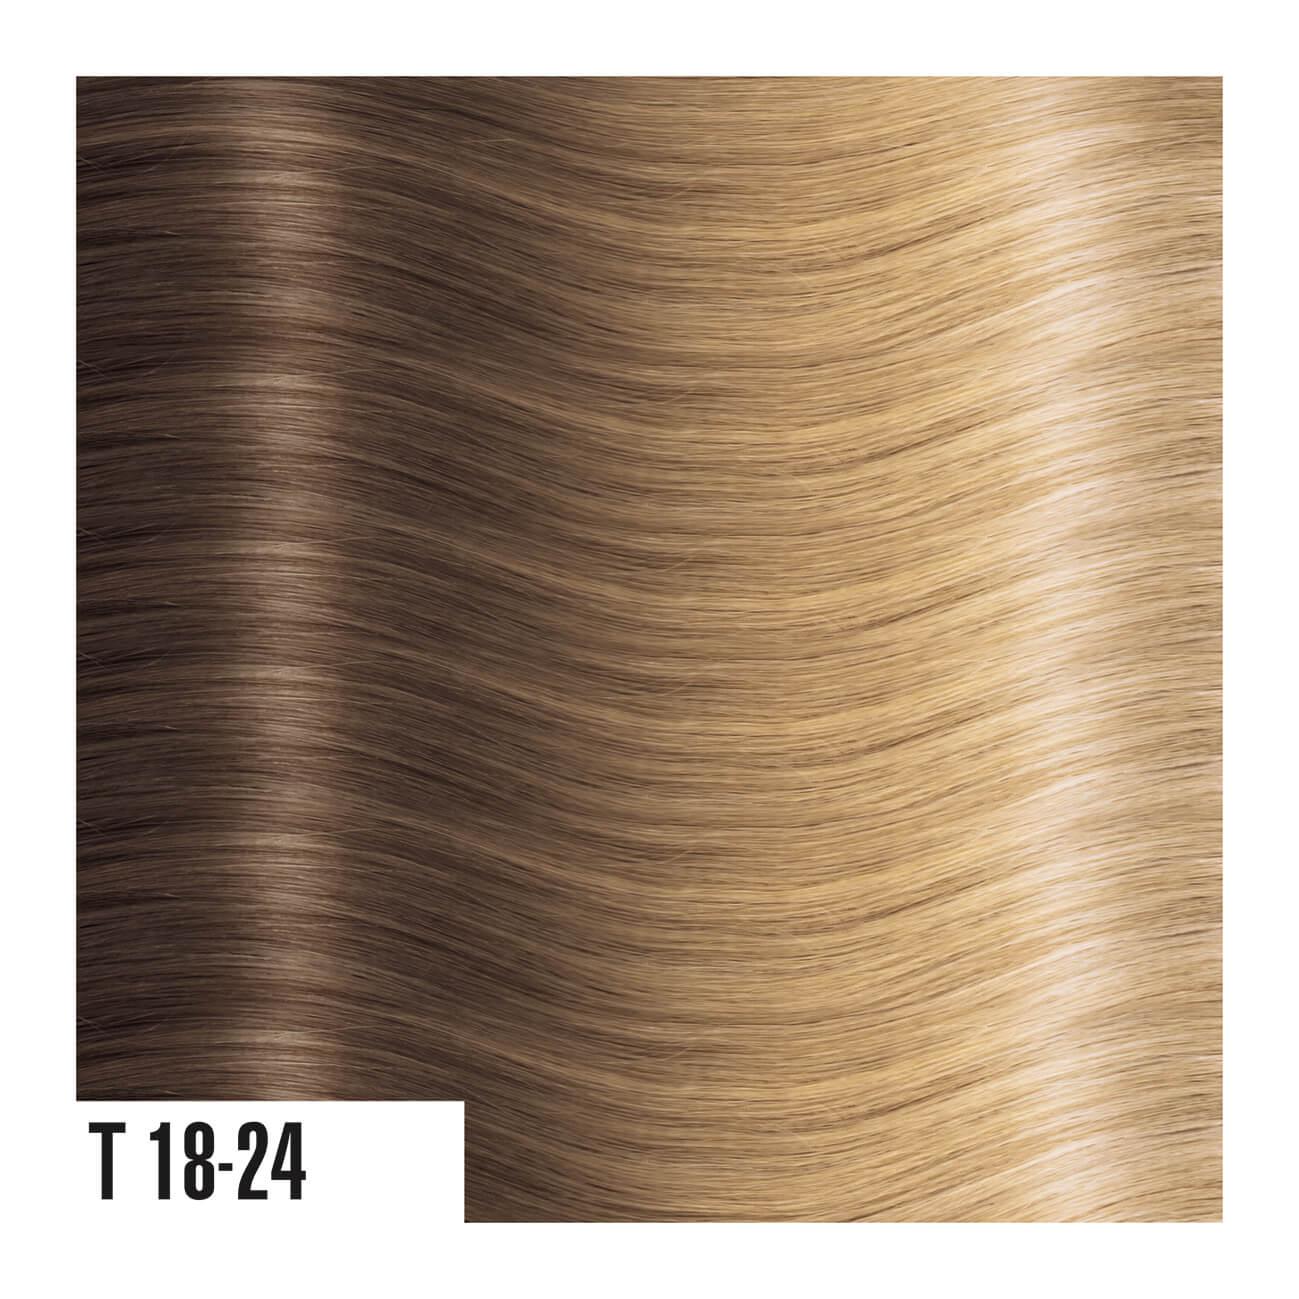 T18-24